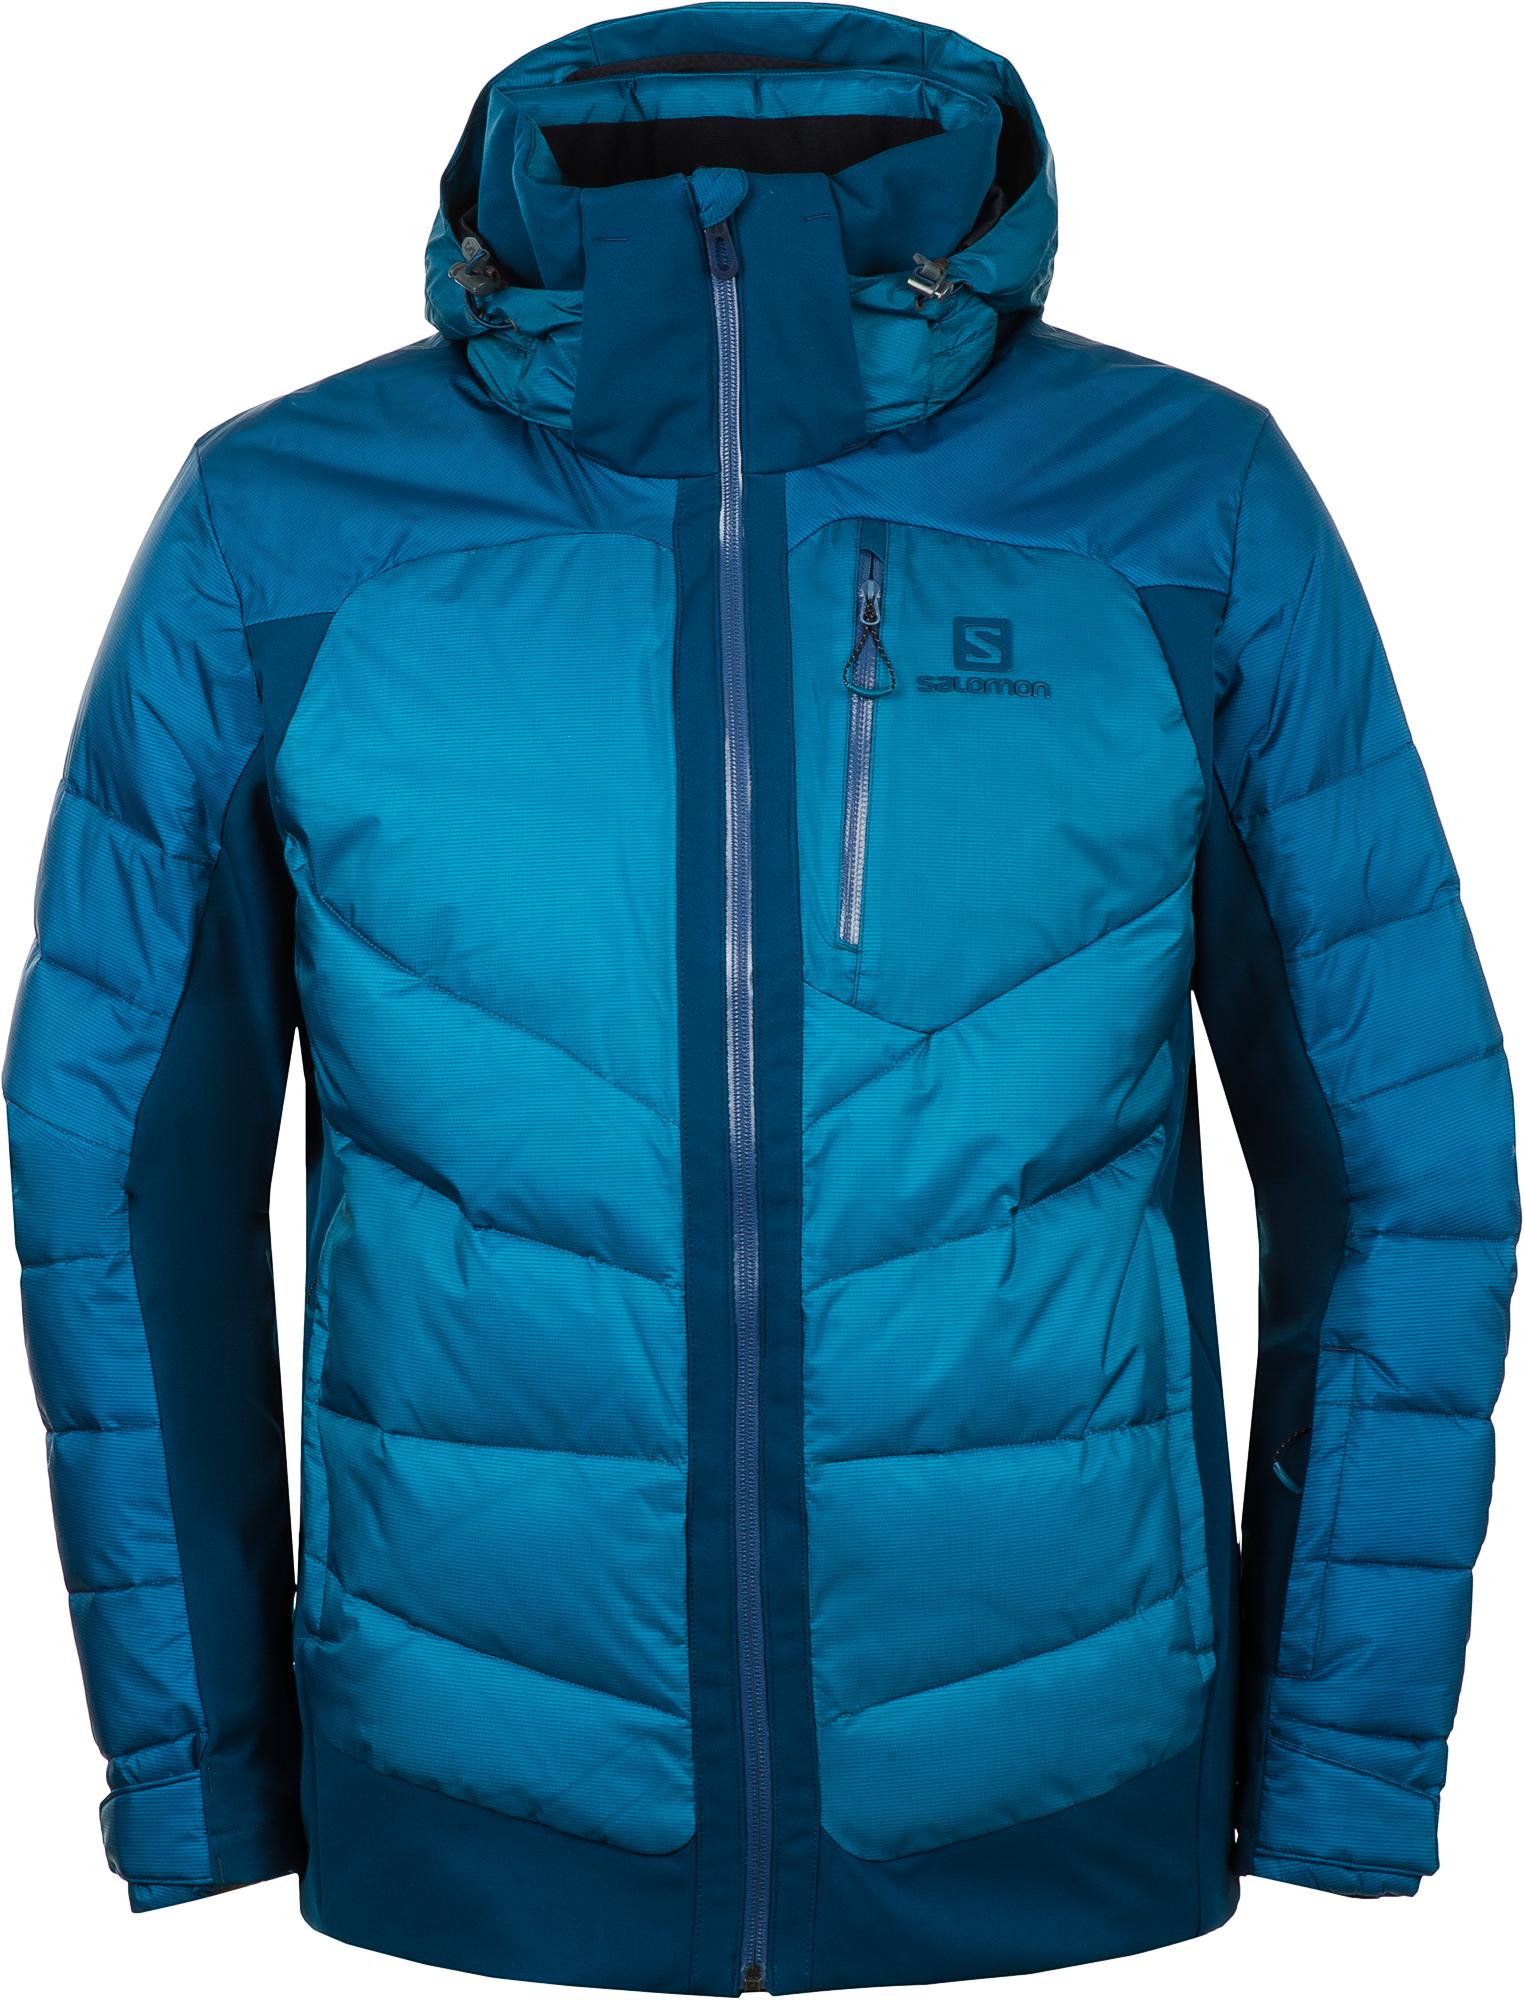 цена Salomon Куртка утепленная мужская Salomon Iceshelf, размер 44-46 онлайн в 2017 году